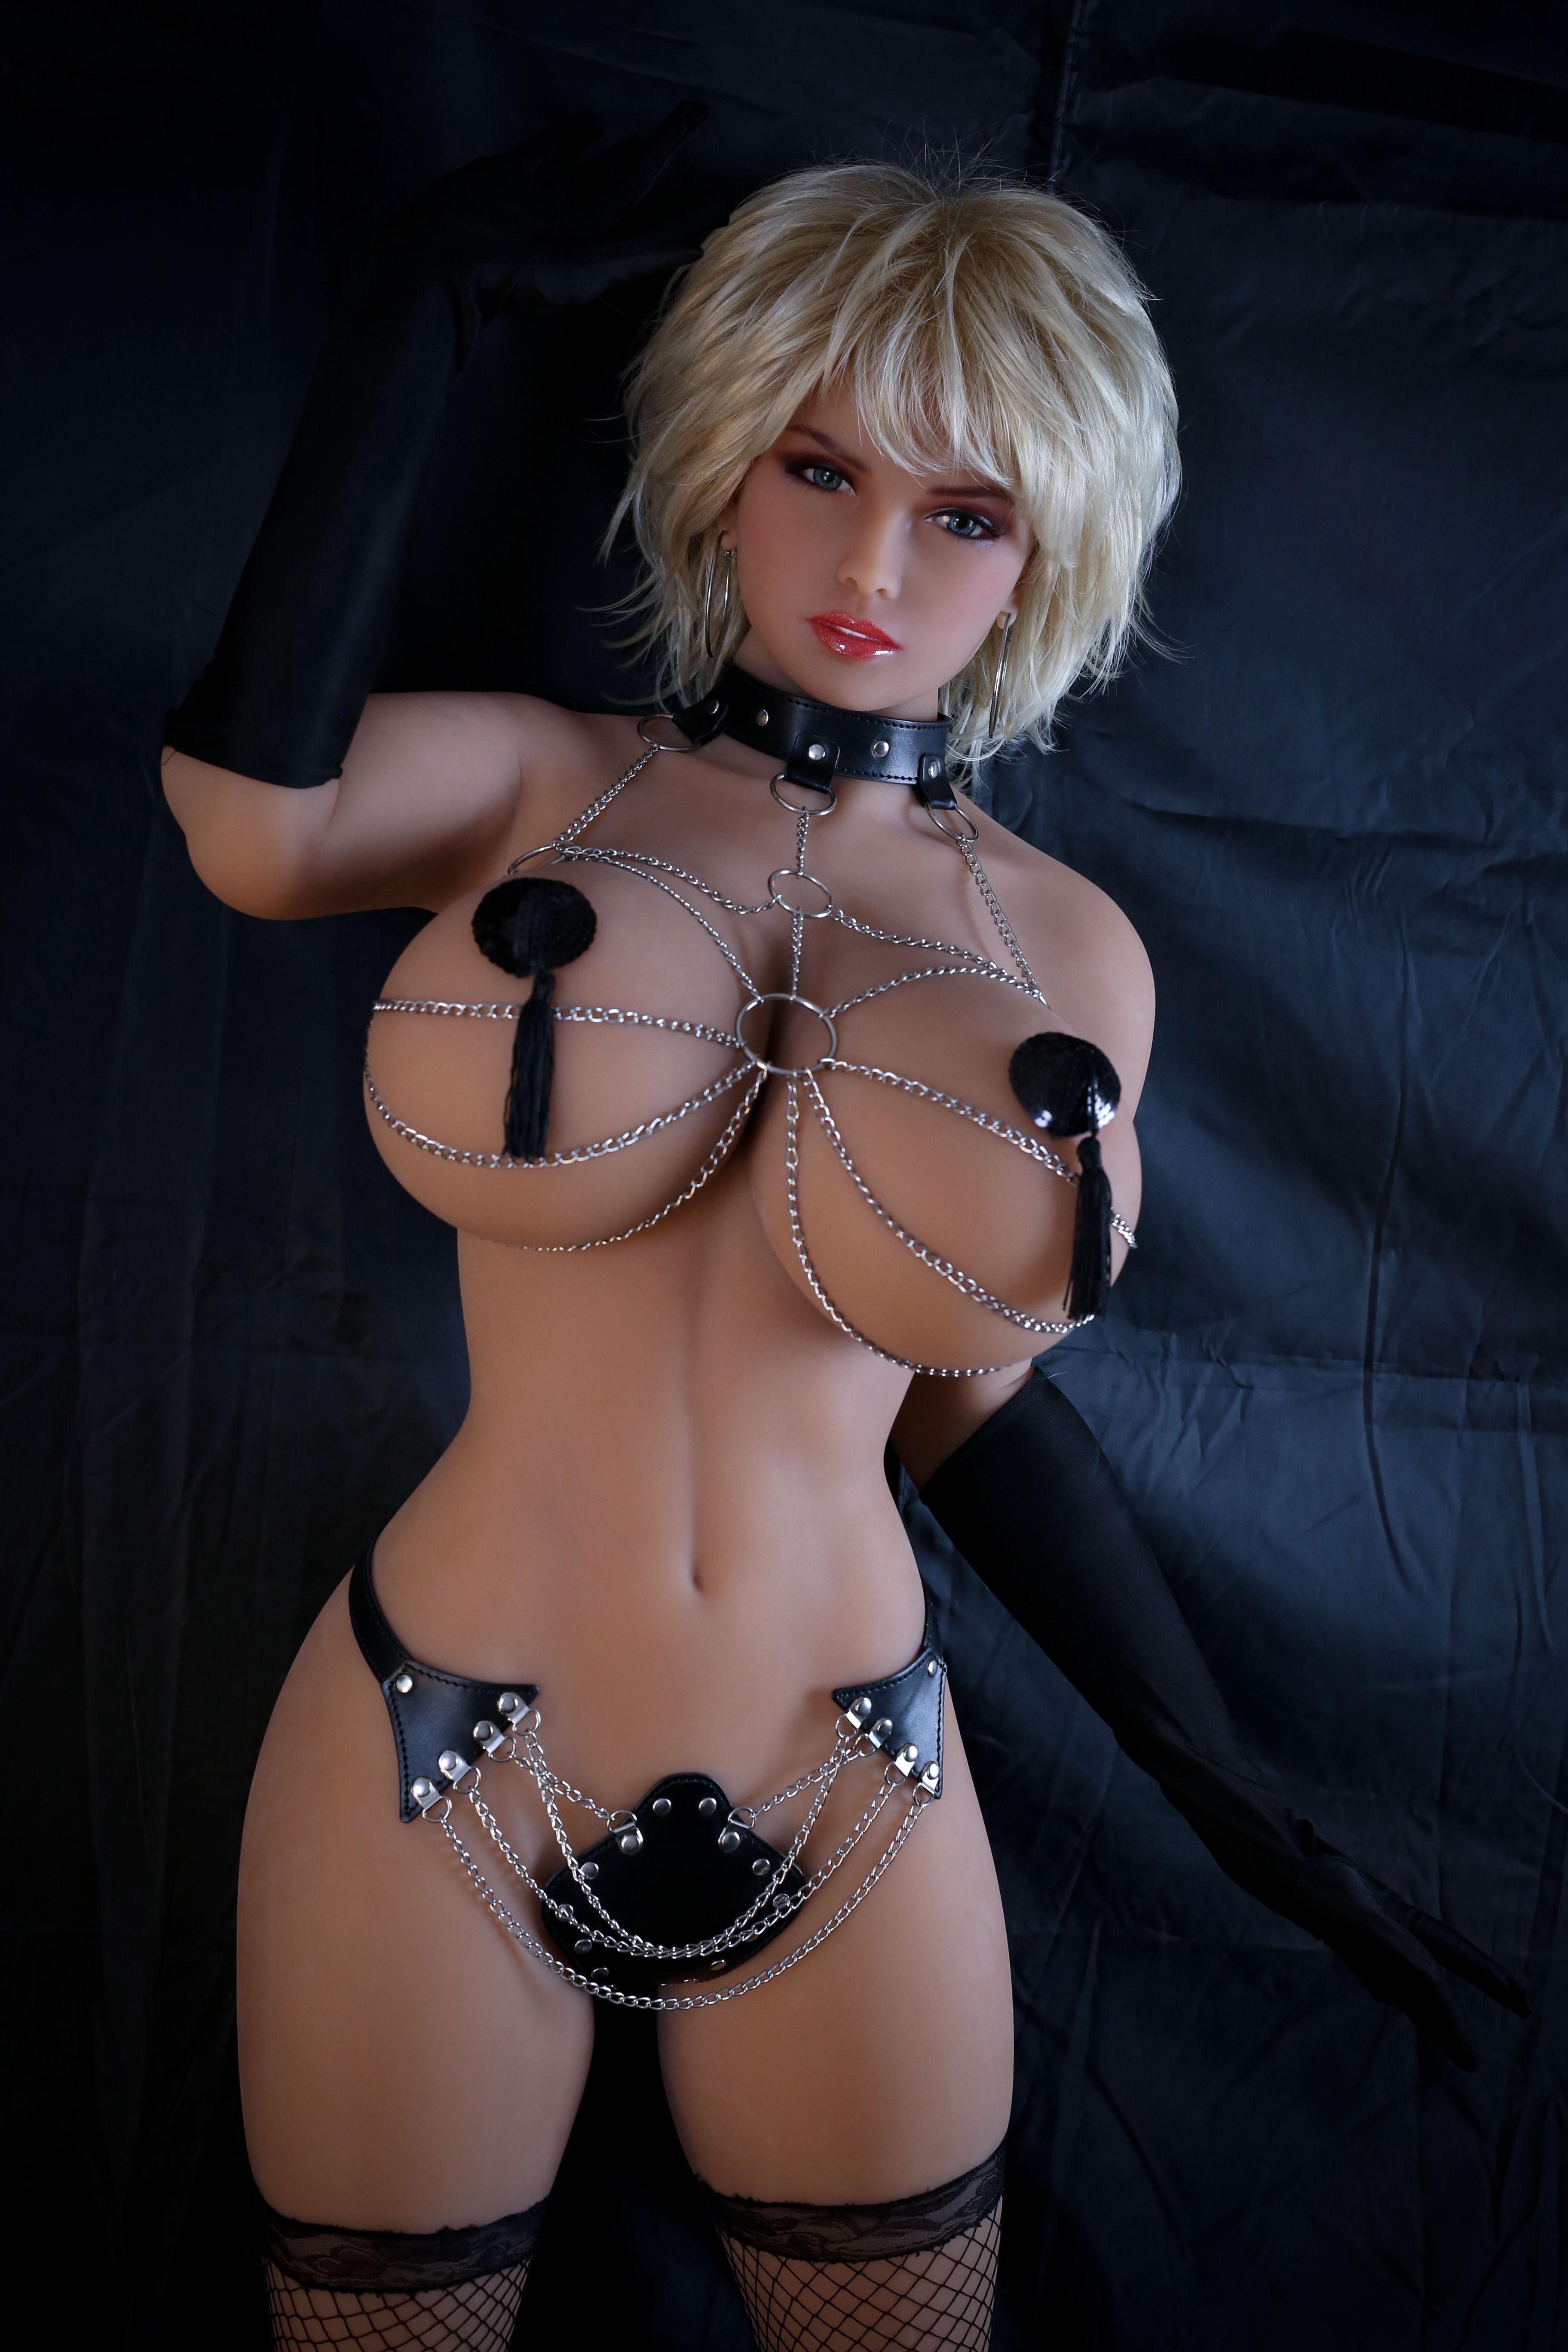 Nikki sexxx veronica rayne glory hole